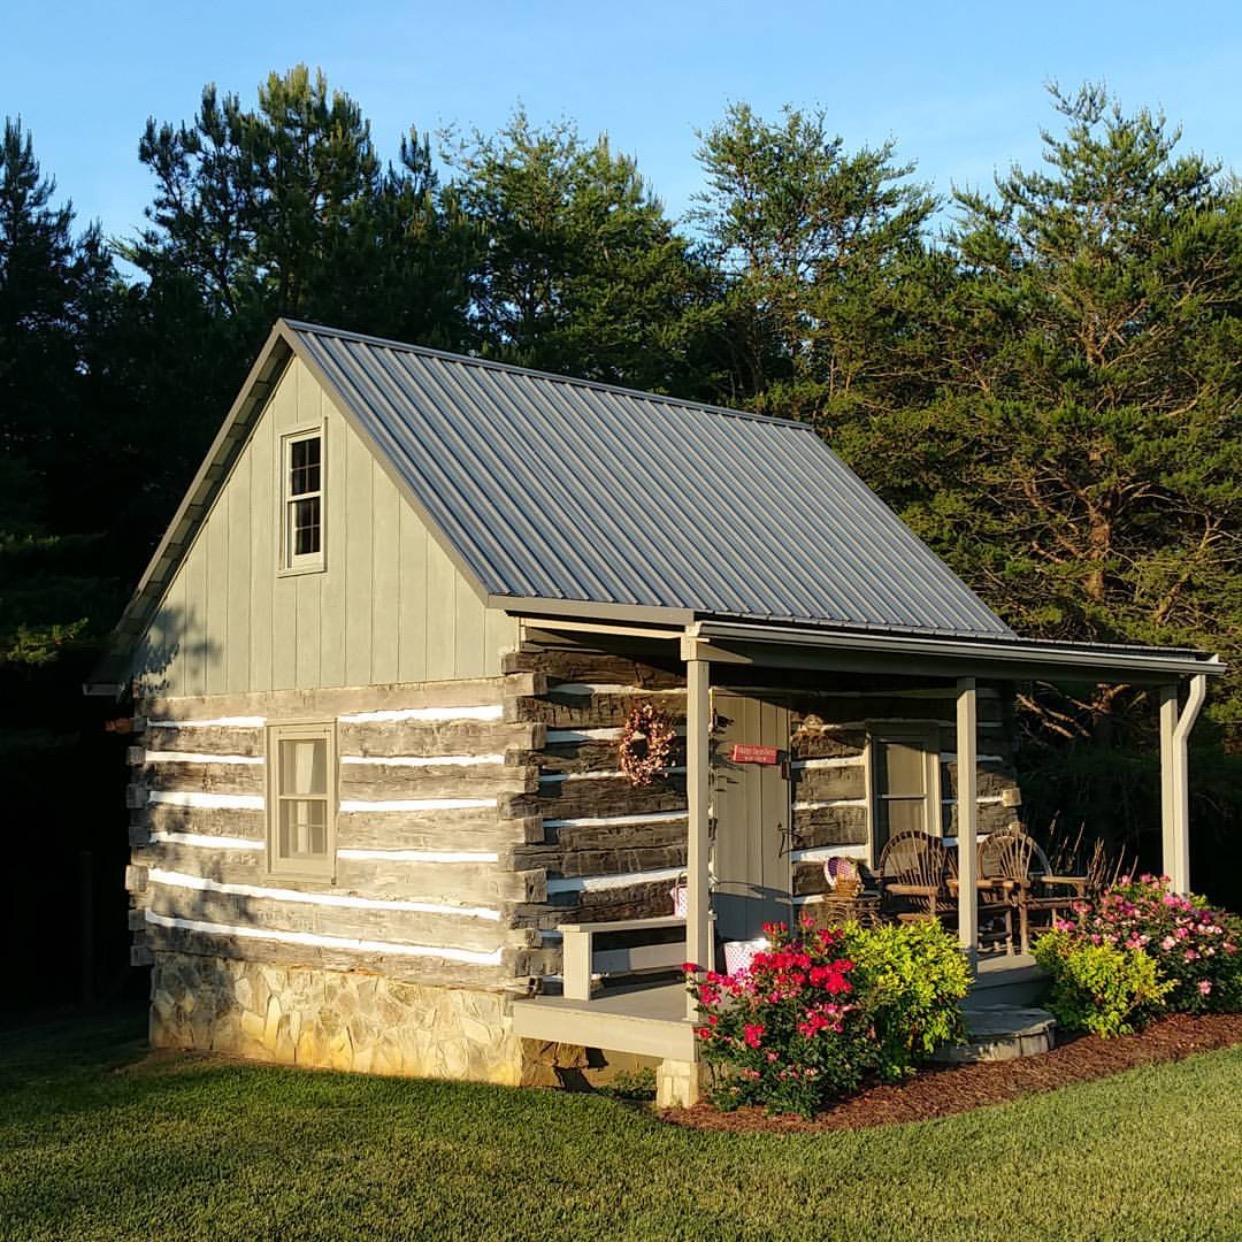 Hood Creek Log Cabin Log Home Tour Series Happy Days Farm